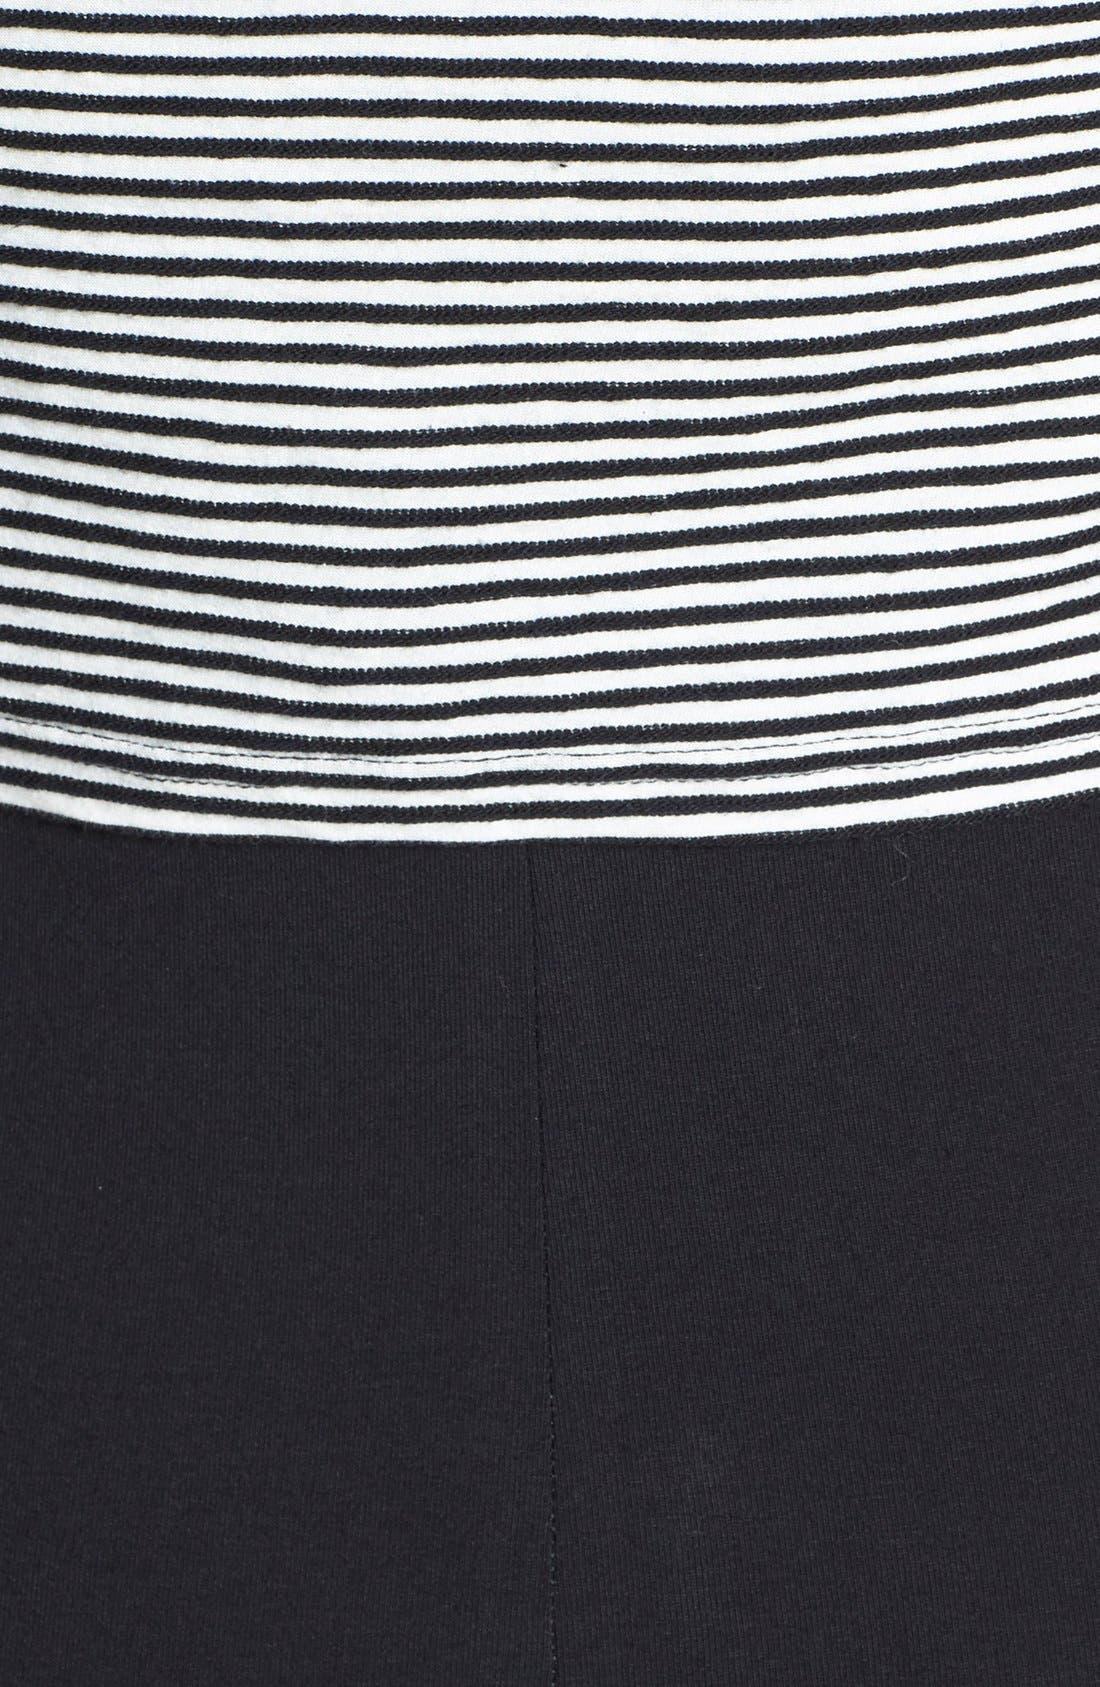 Alternate Image 3  - Topshop Stripe High Neck T-Shirt Dress